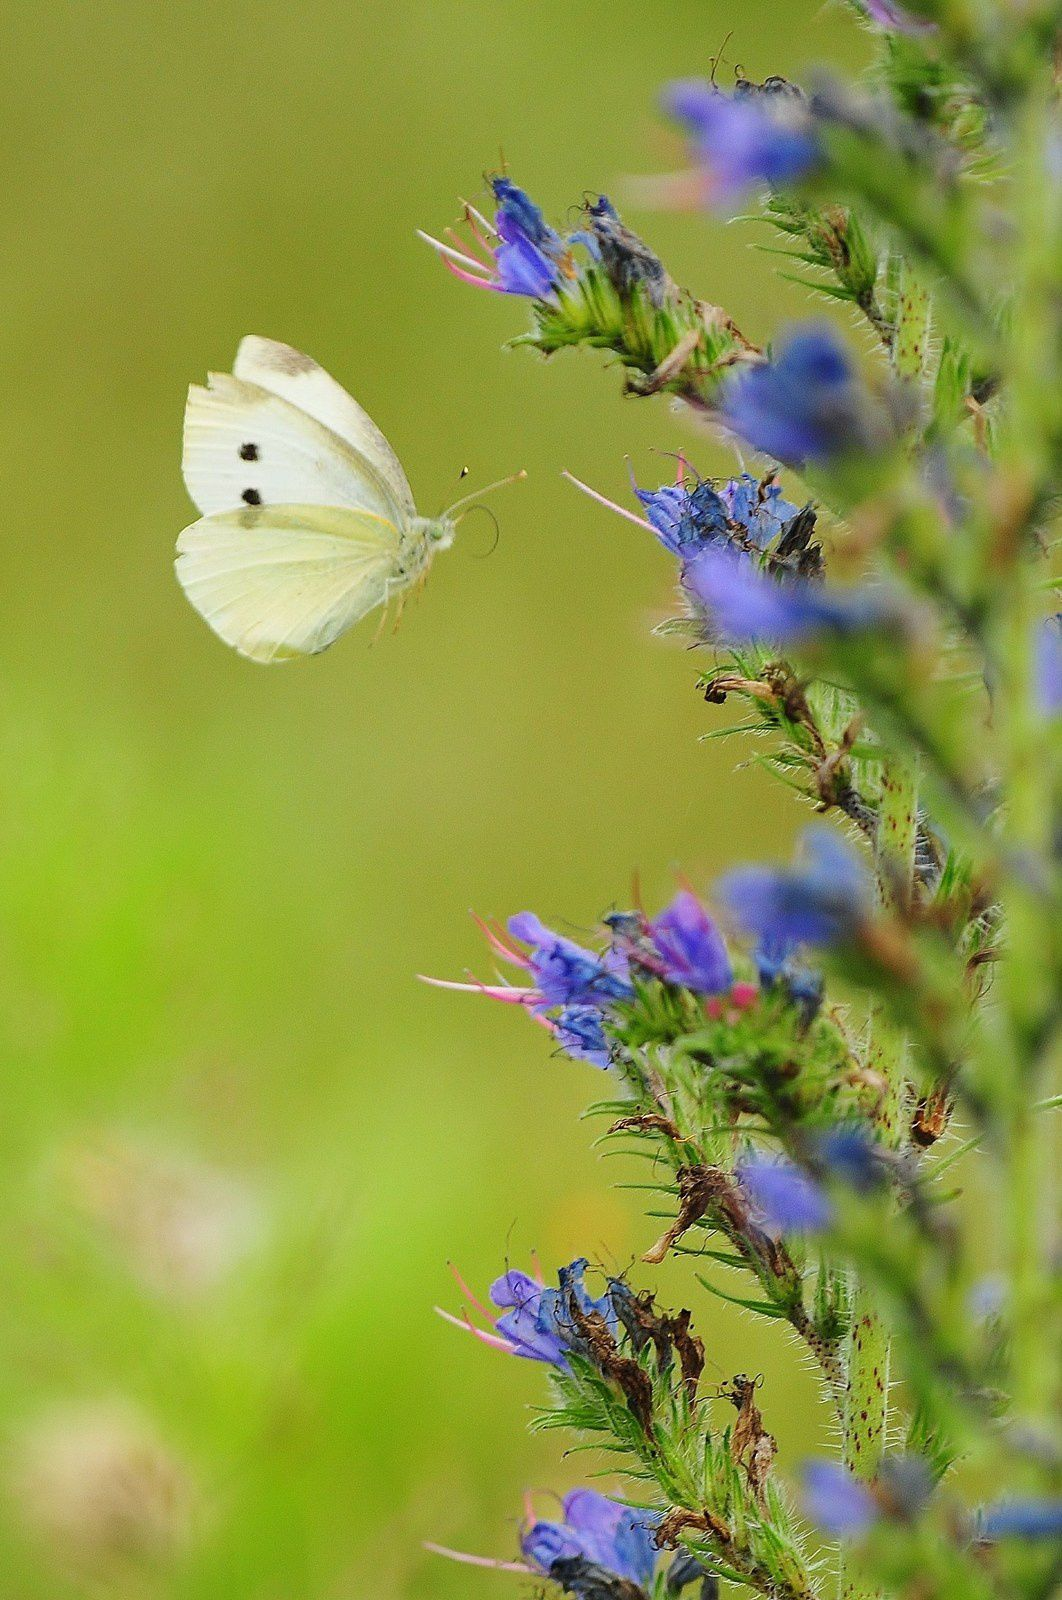 Piéride de la rave (Pieris rapae).